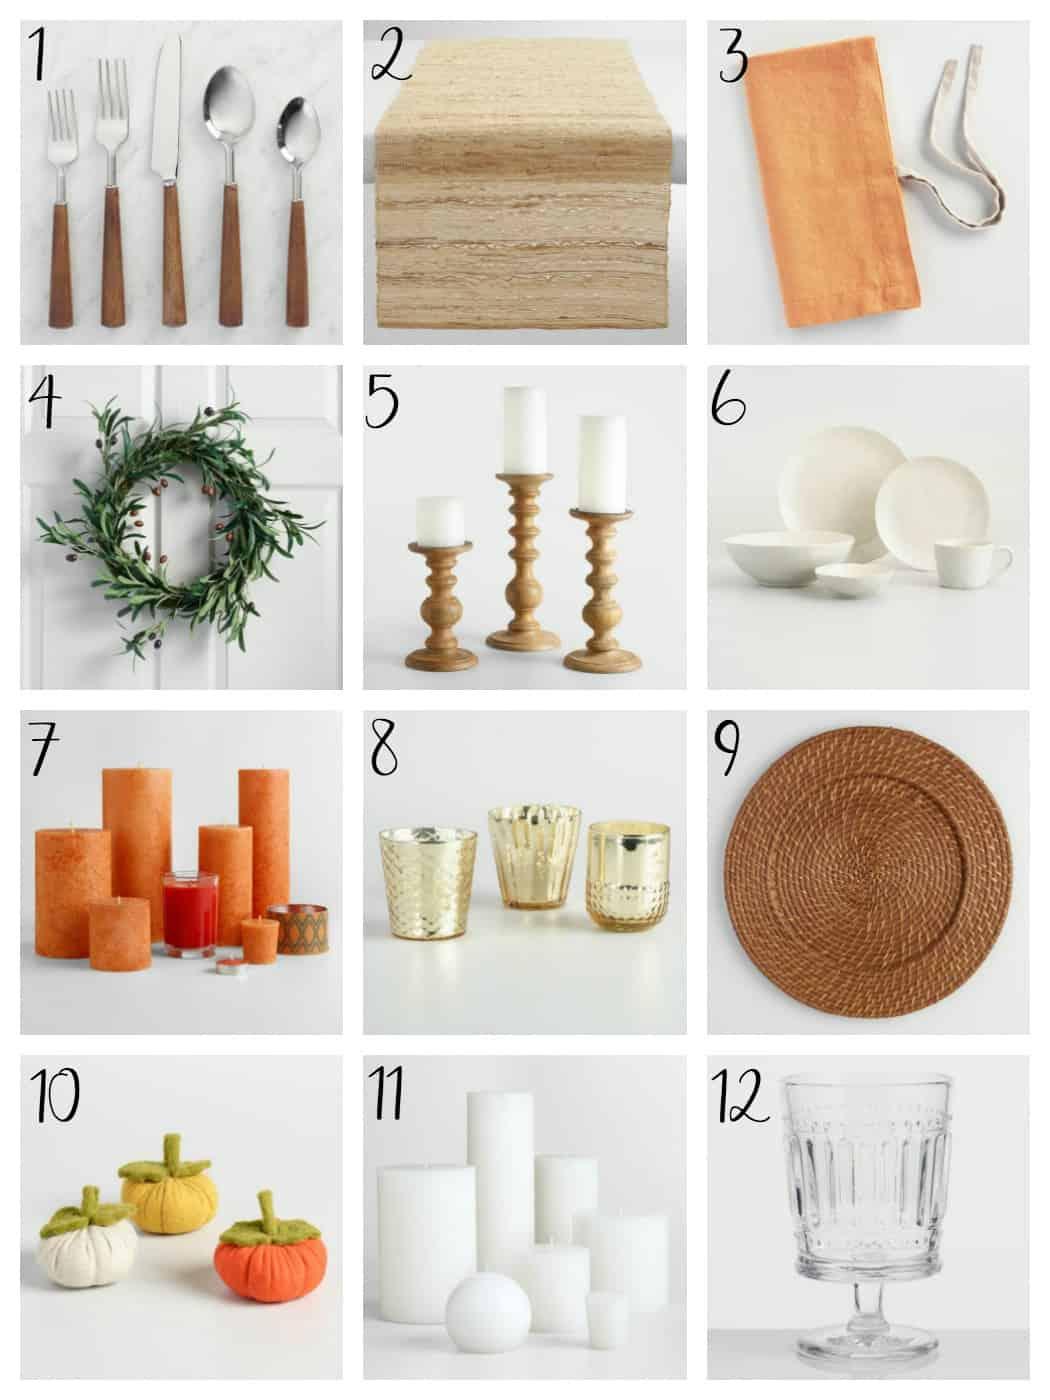 How to Make the Perfect Farmhouse Neutral Fall Tablescape @makingjoysarah for @worldmarket #worldmarket #ad #worldmarkettribe